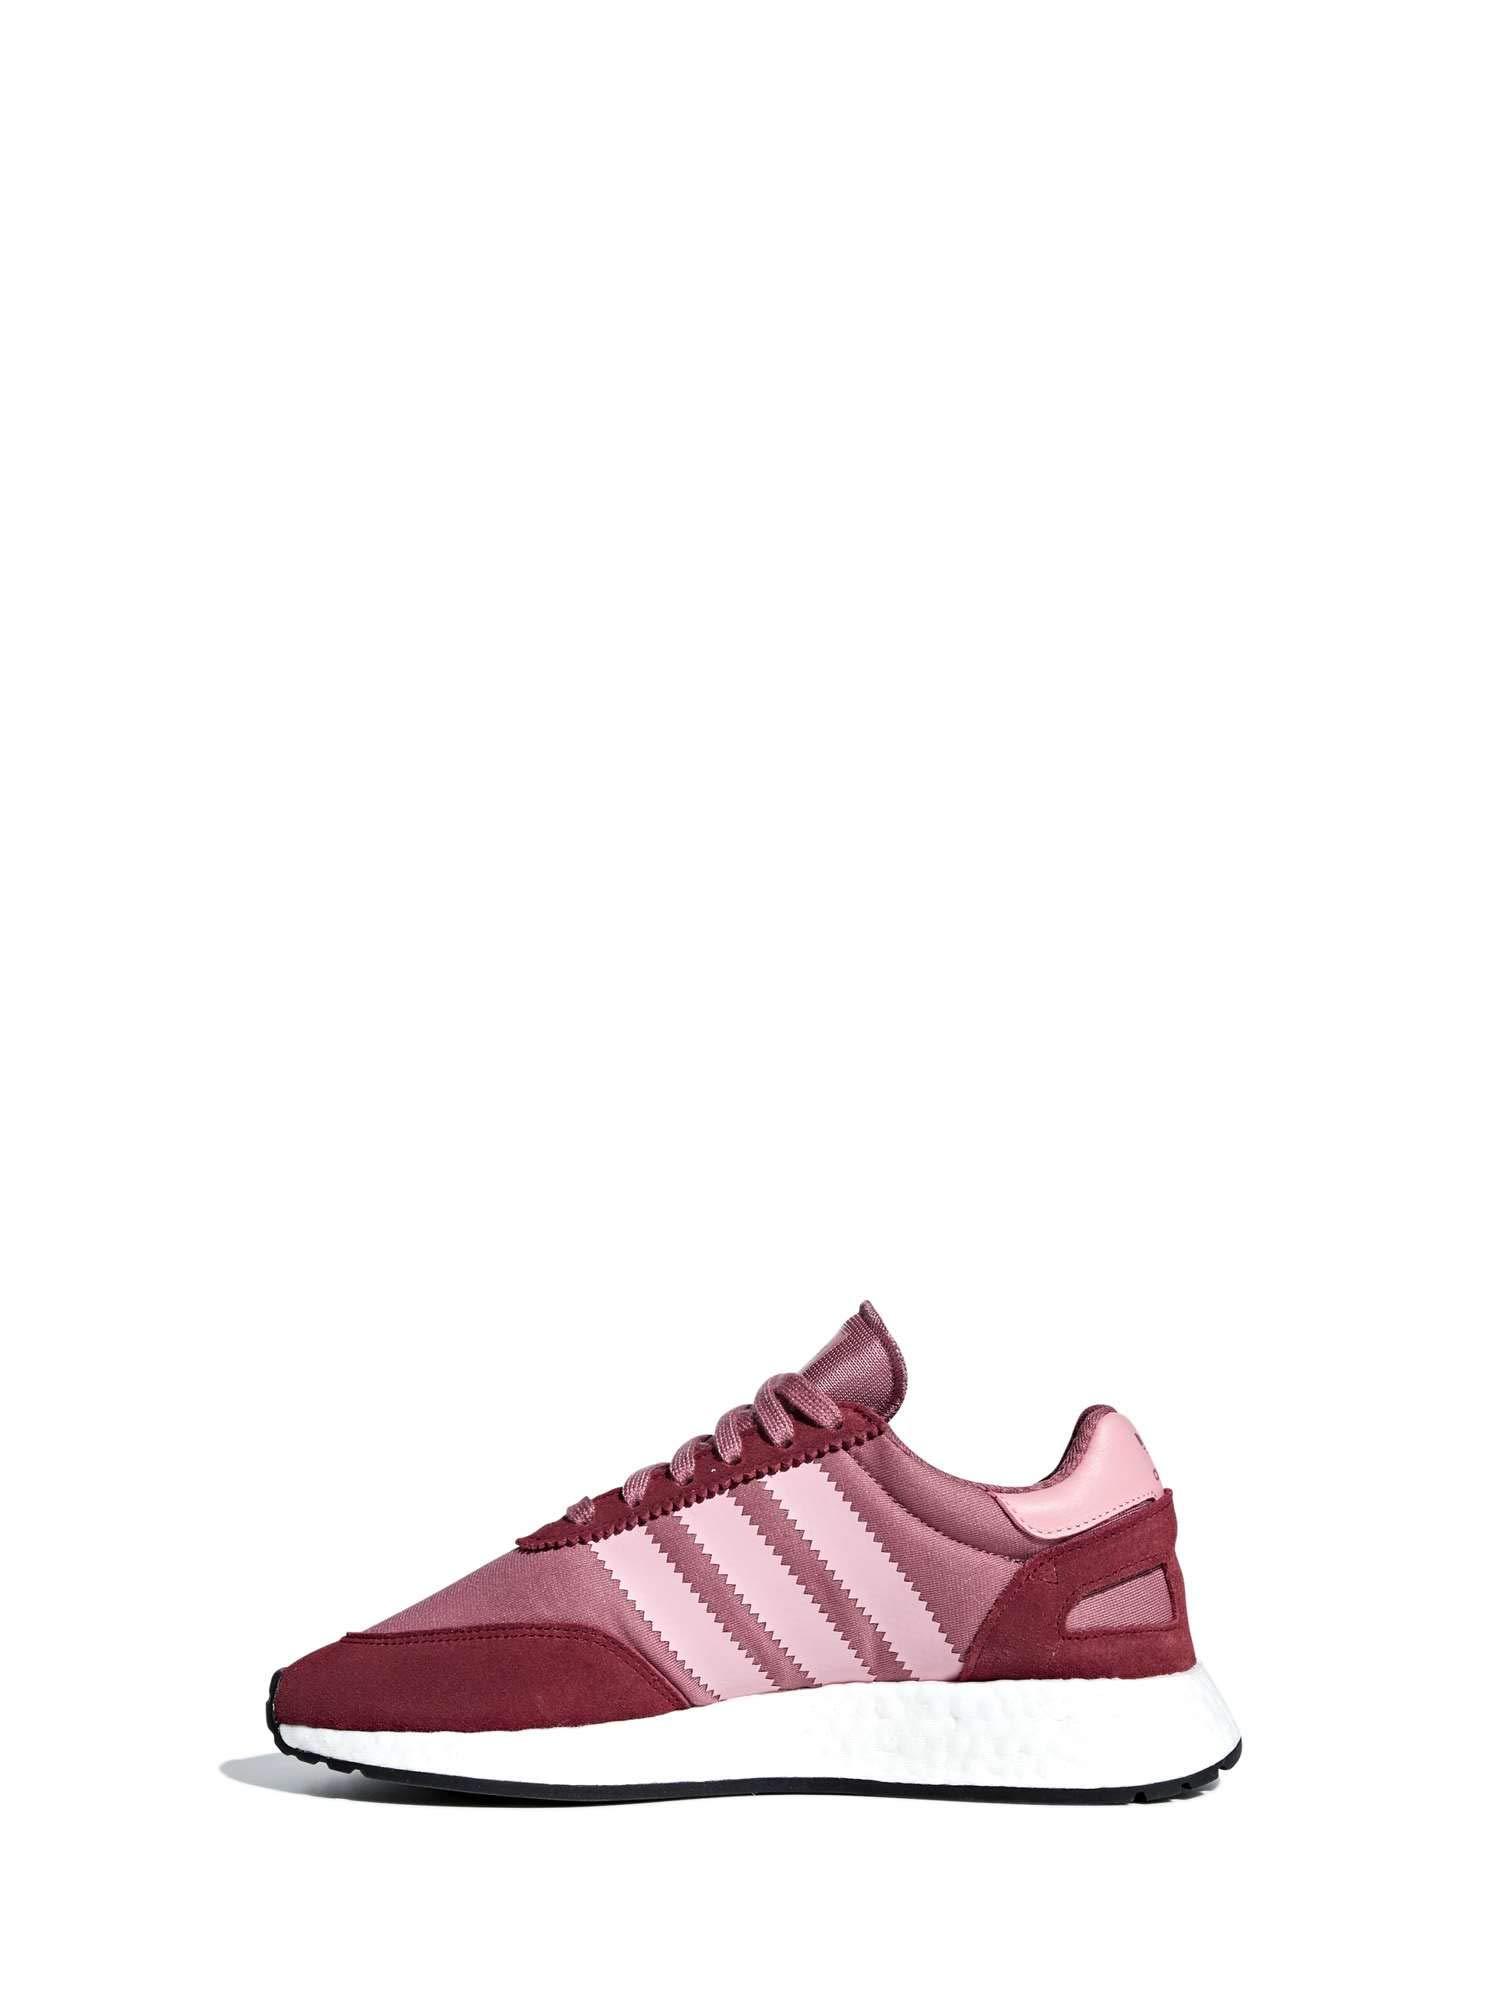 adidas Originals I-5923 Women 5 spesavip